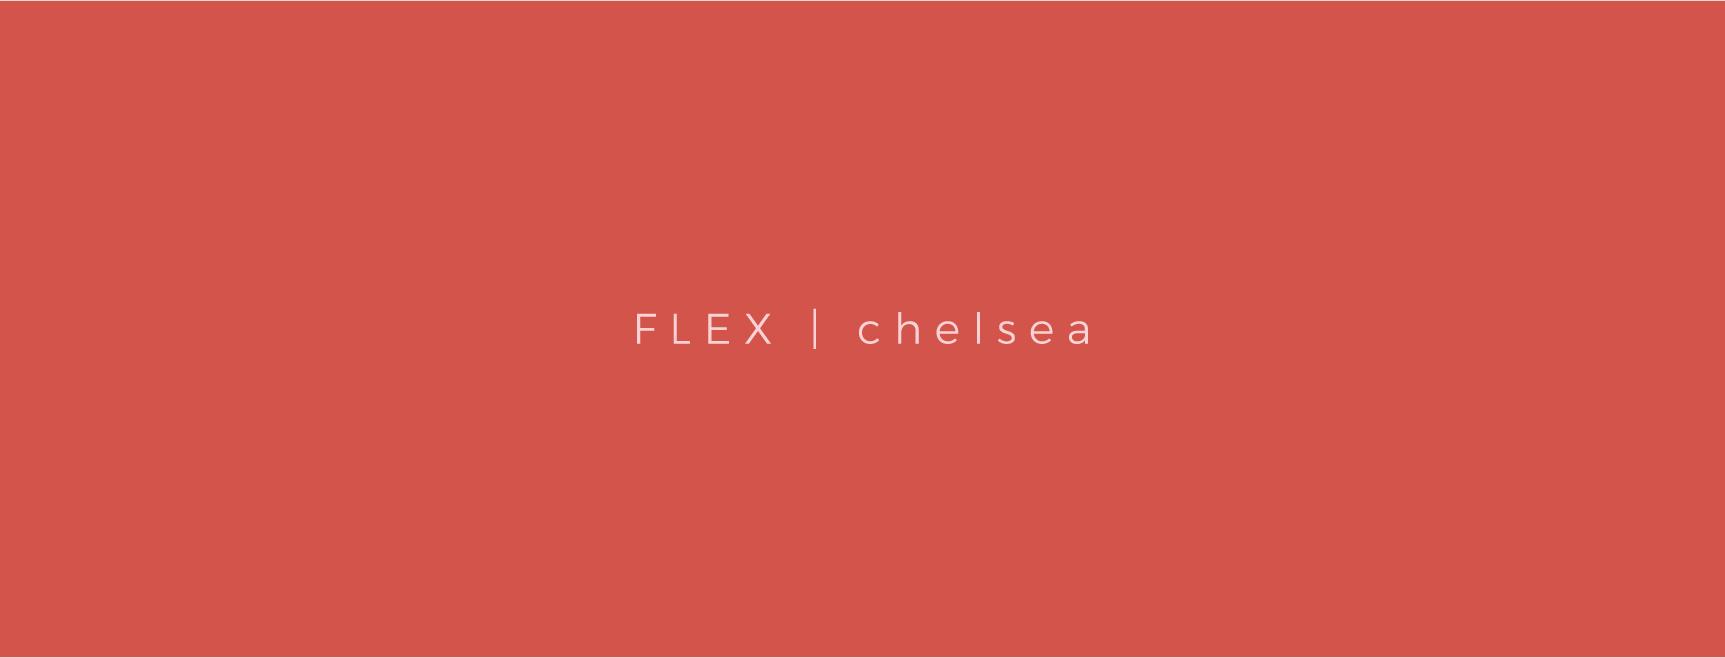 Flex_Facebook_CoverImage-02.jpg